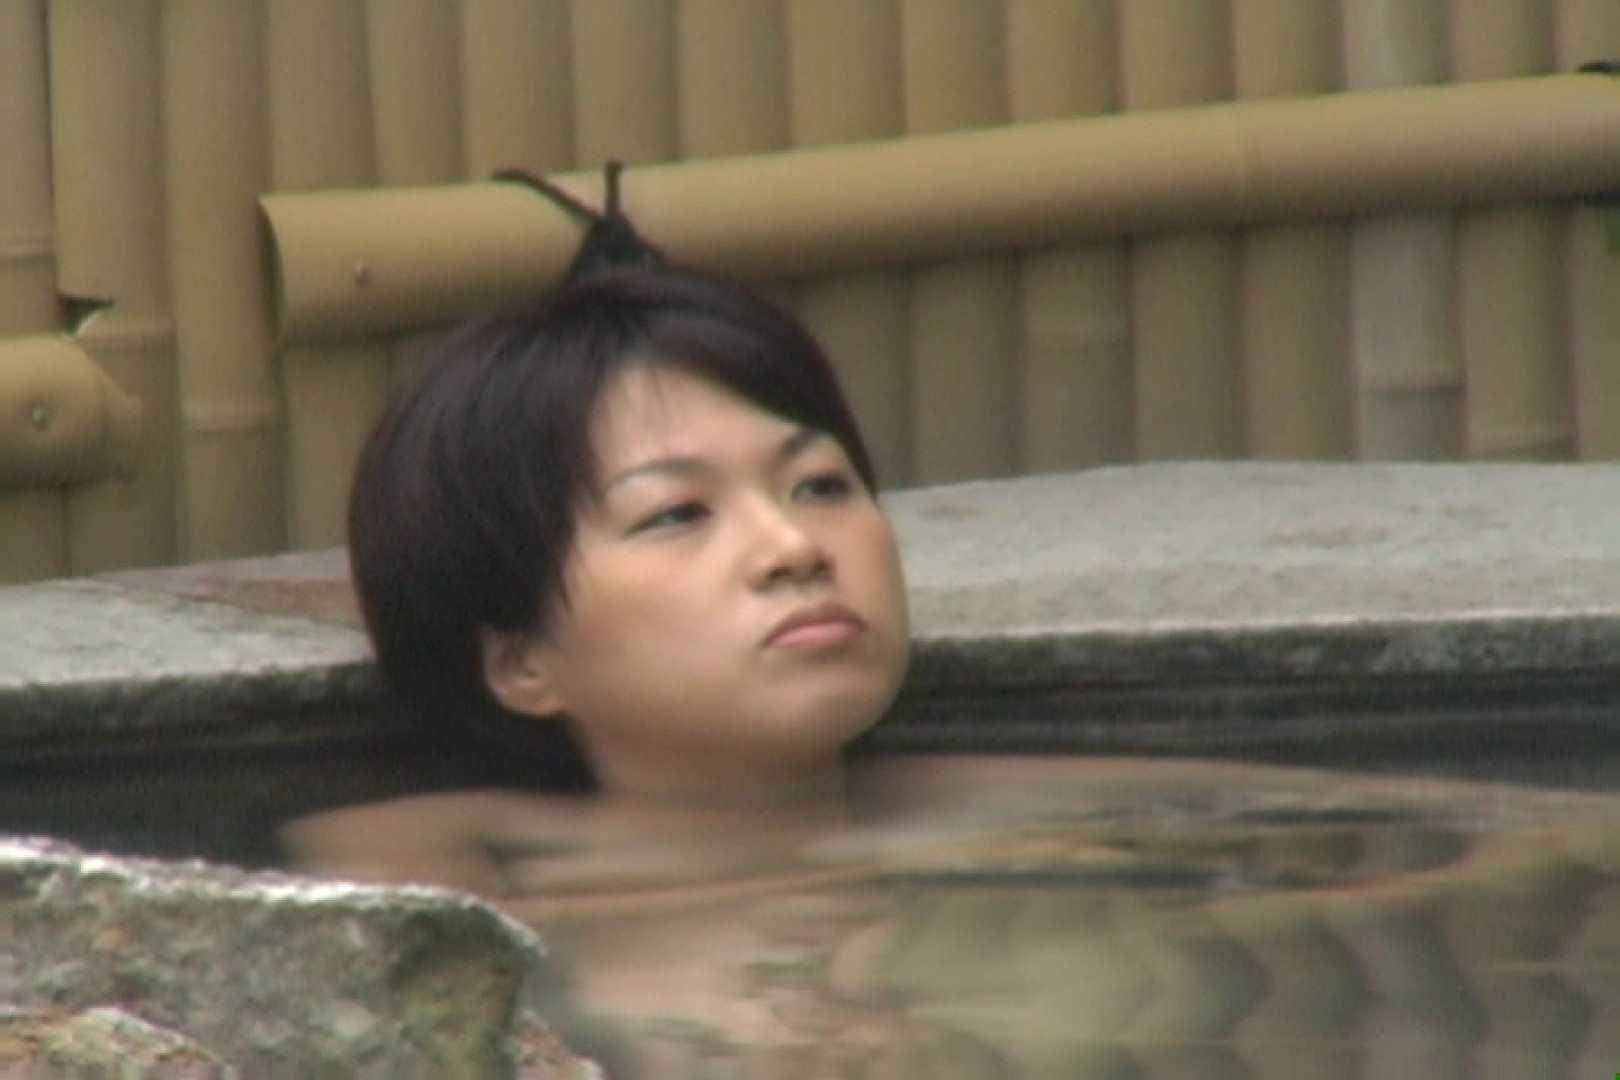 Aquaな露天風呂Vol.624 OLのエロ生活   露天風呂  41連発 22